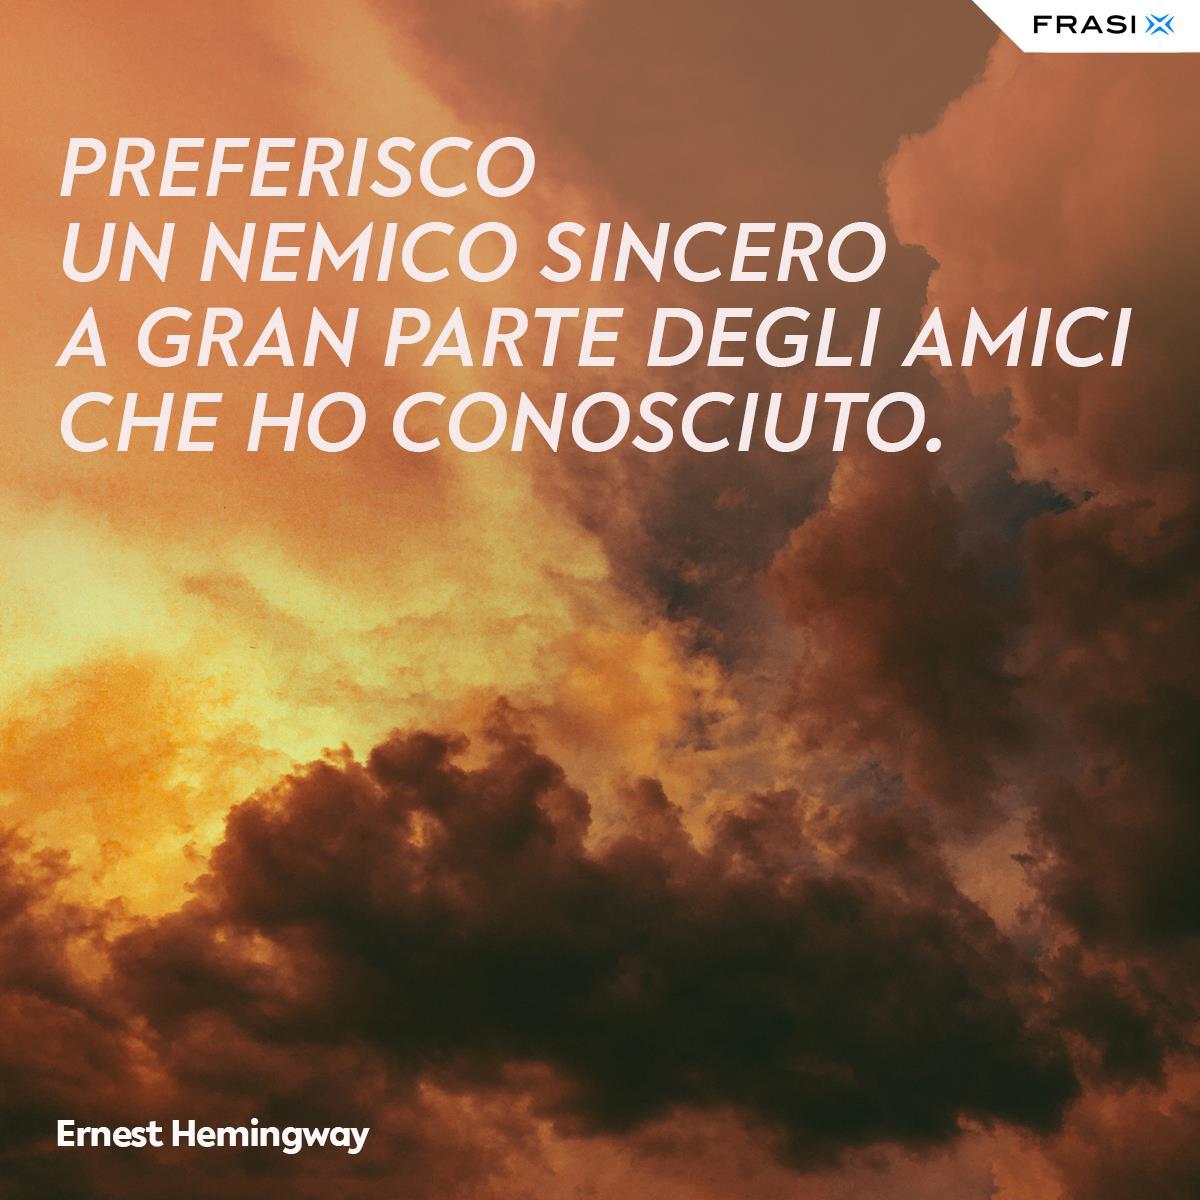 Frasi depresse amicizia Ernest Hemingway